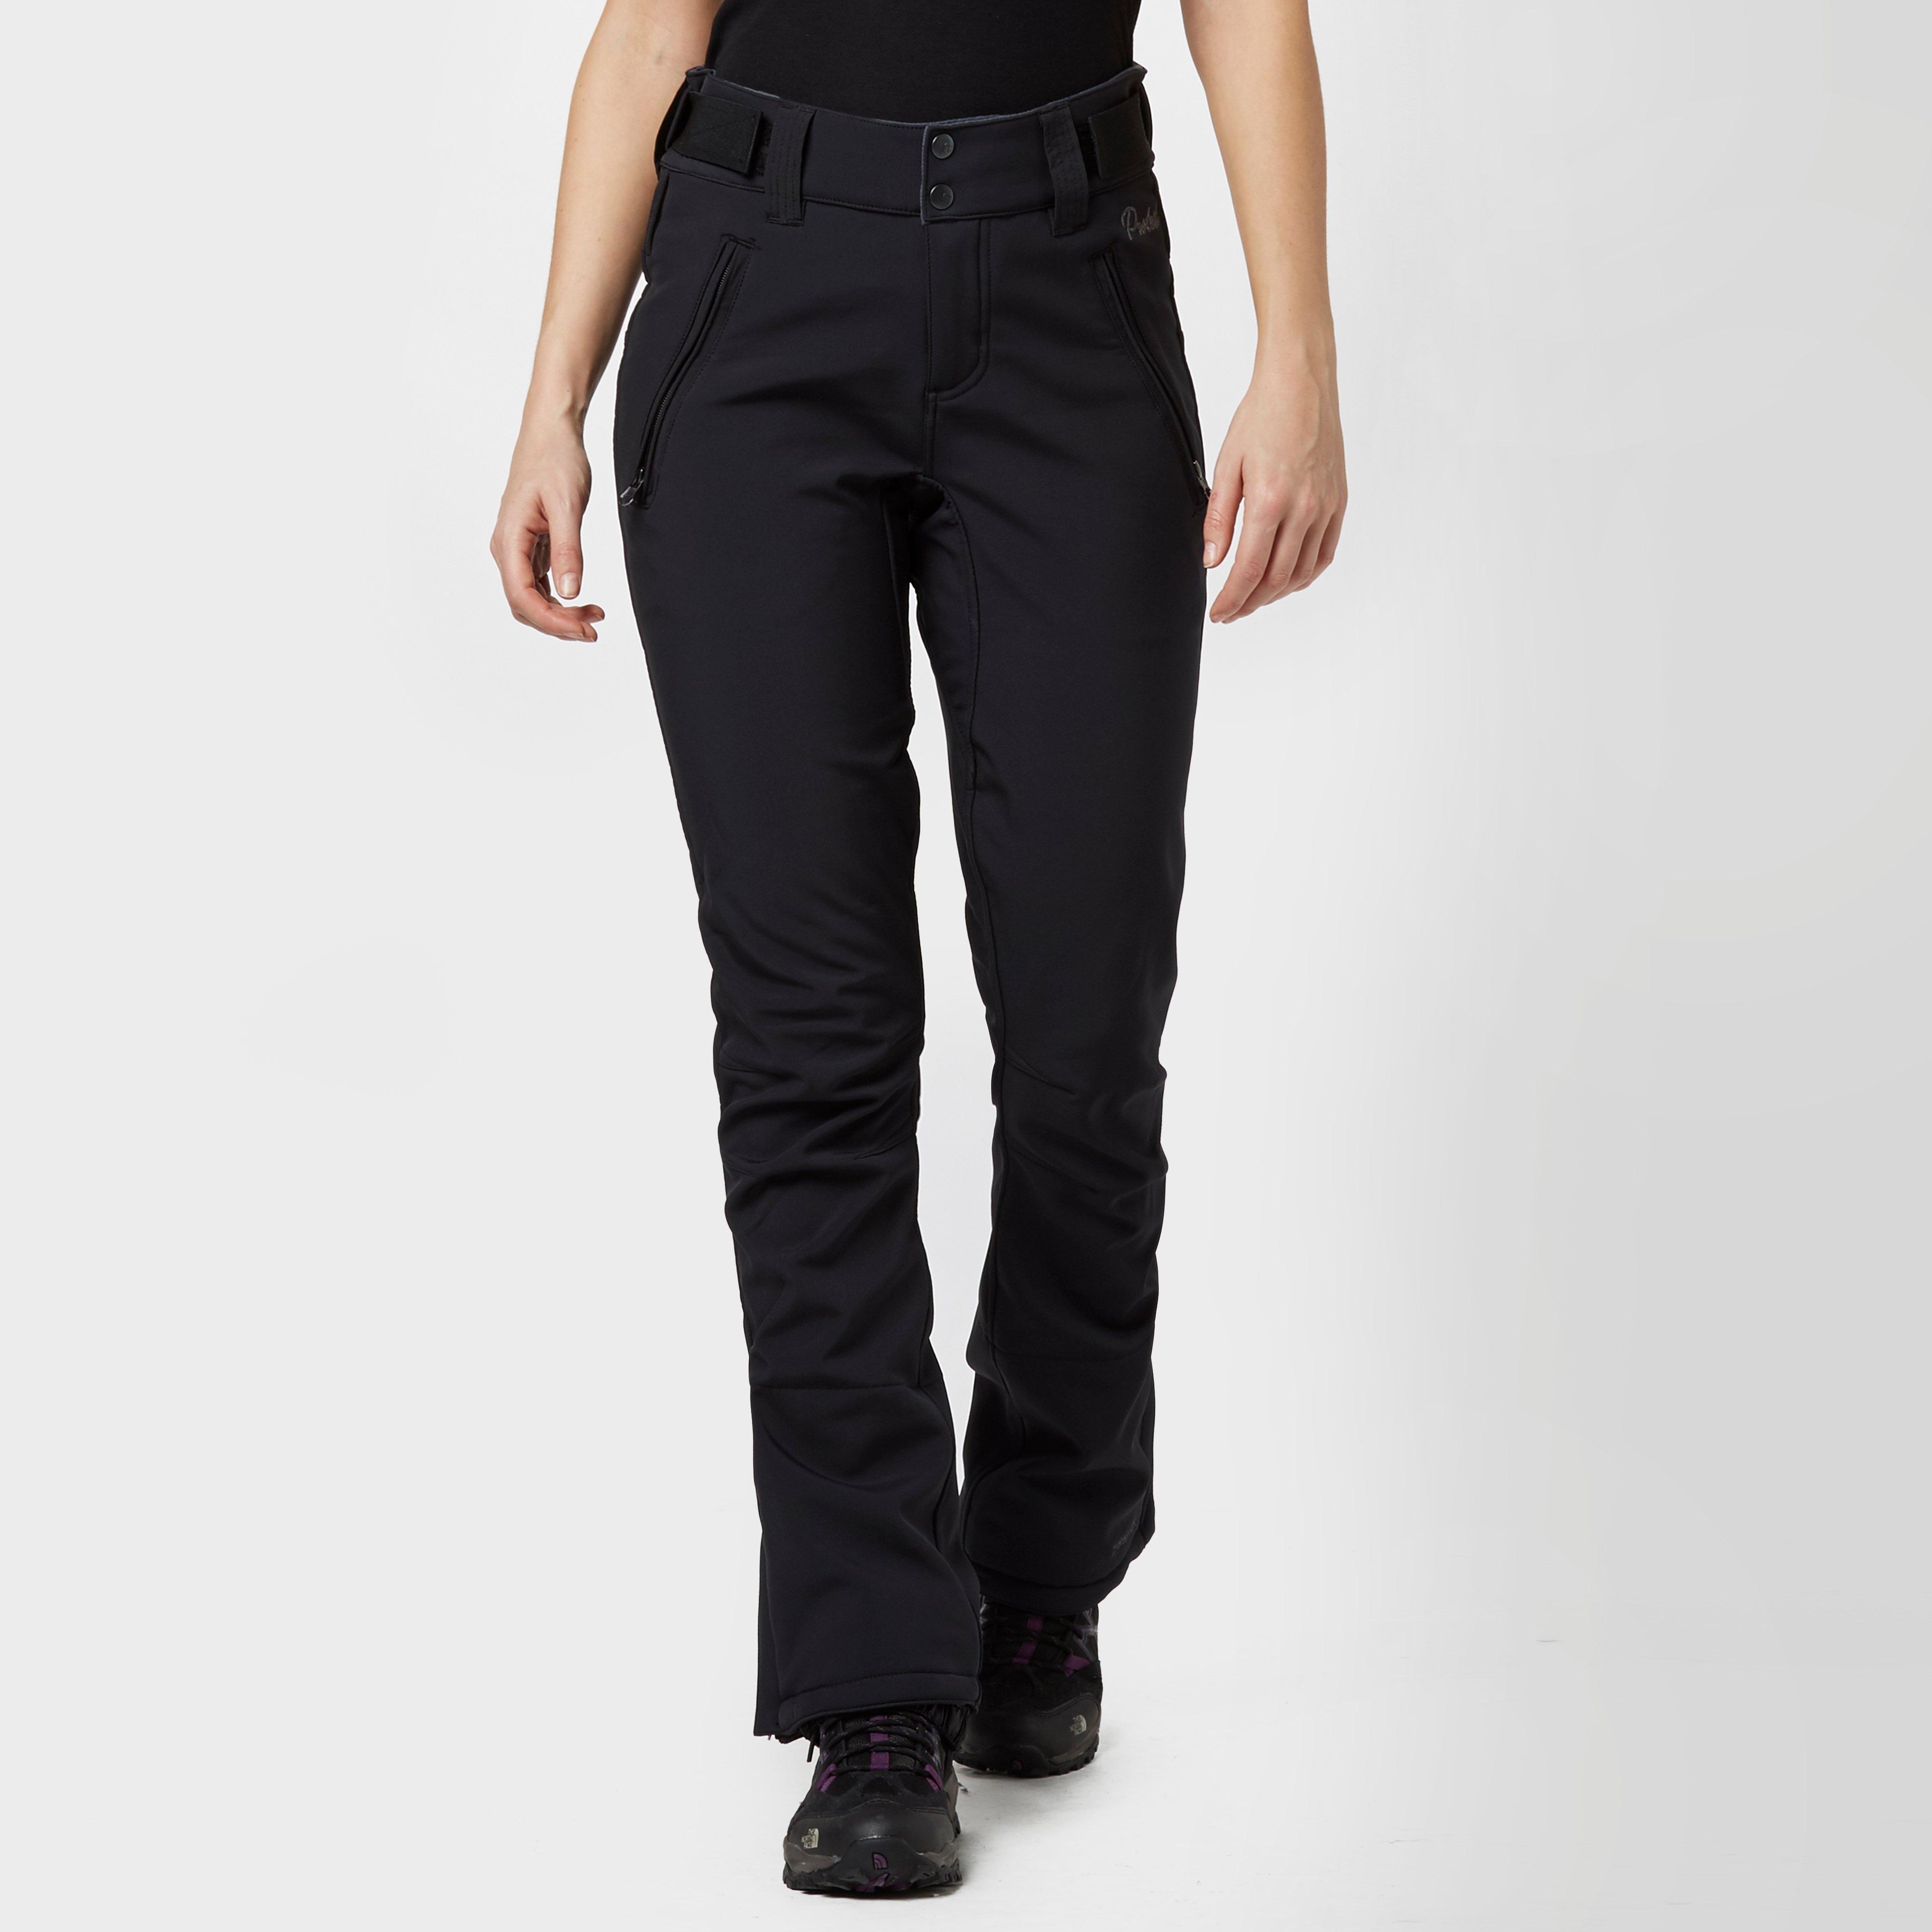 Protest Women's Lole Softshell Ski Pants - Black/Blk, Black